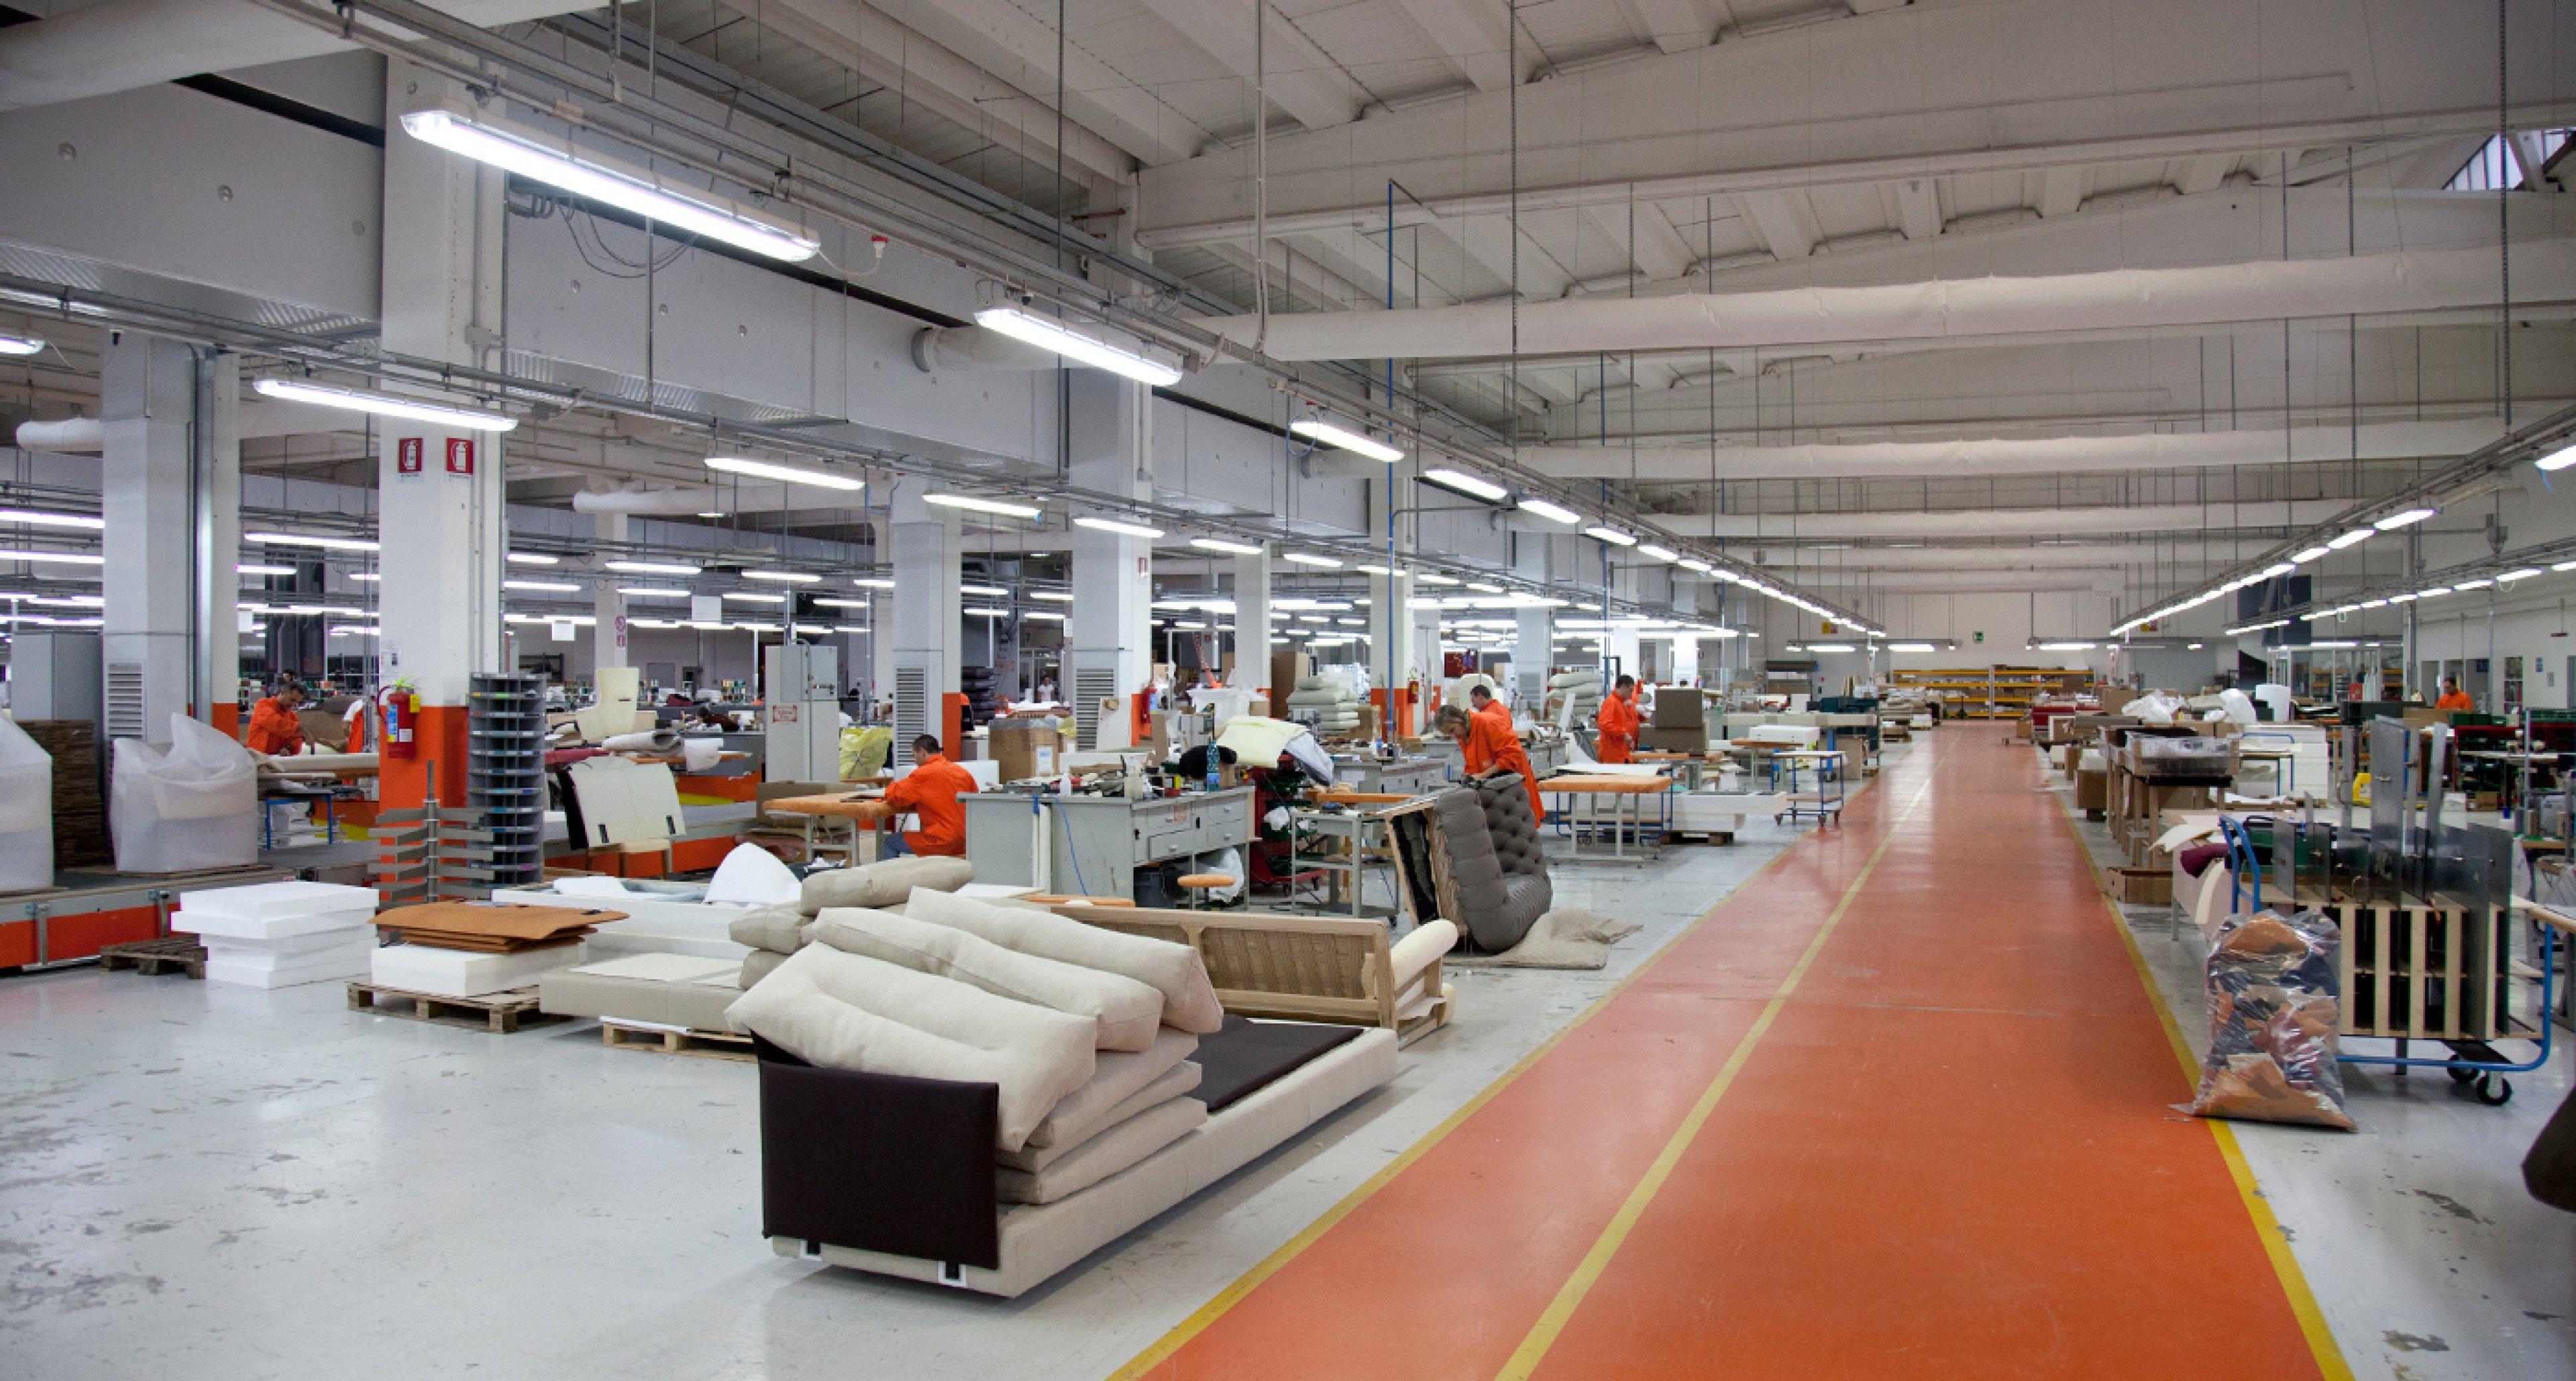 The Poltrona Frau factory in Tolentino.